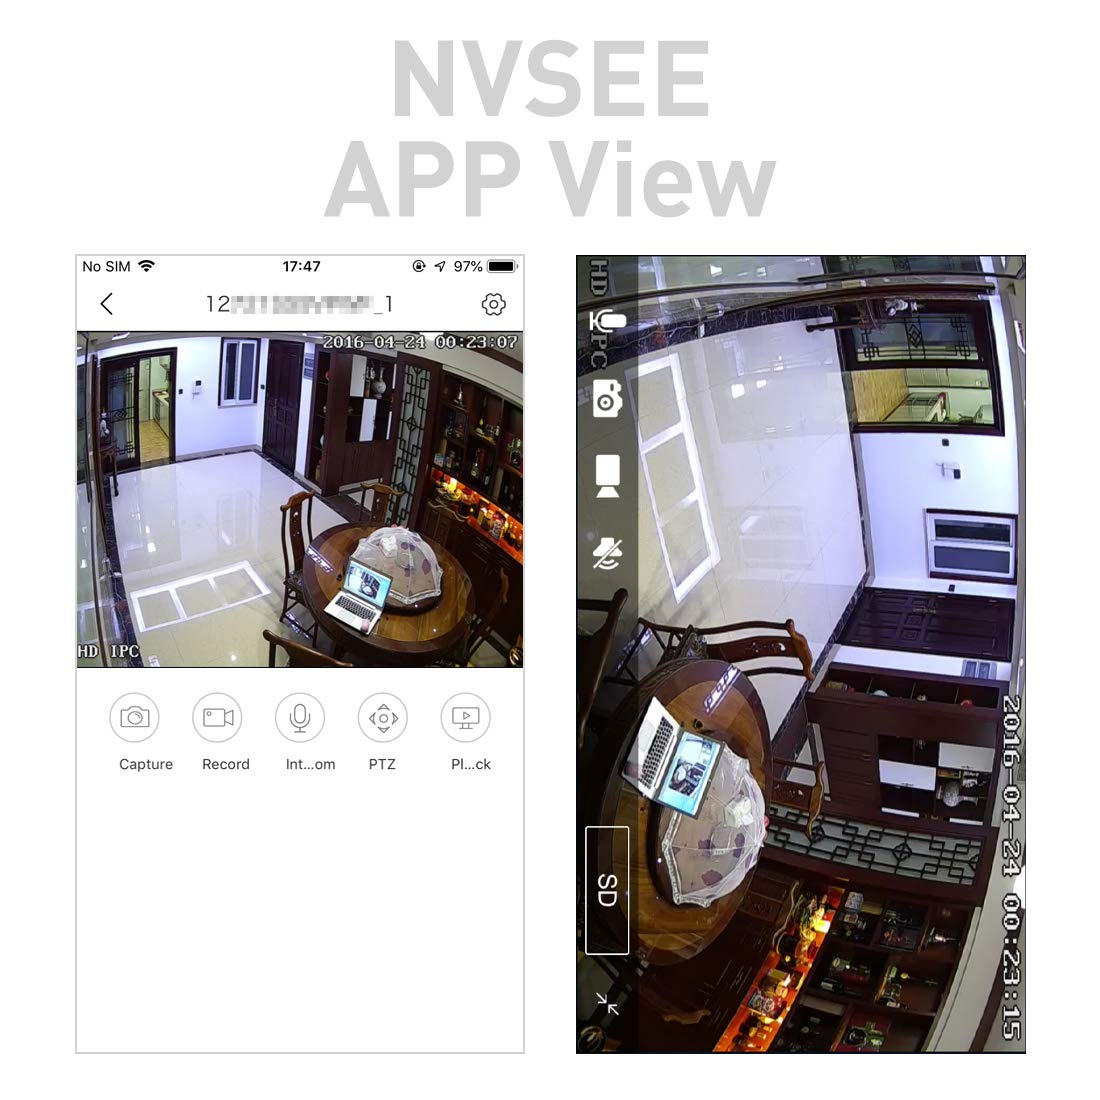 I706-2-P Negro PoE HD 3MP Mini c/ámara IP Revotech/® H.265 1080P 1296P 2MP para Interior Agujero de alfiler Metal C/ámara Seguridad ONVIF P2P CCTV C/ámara Sistema